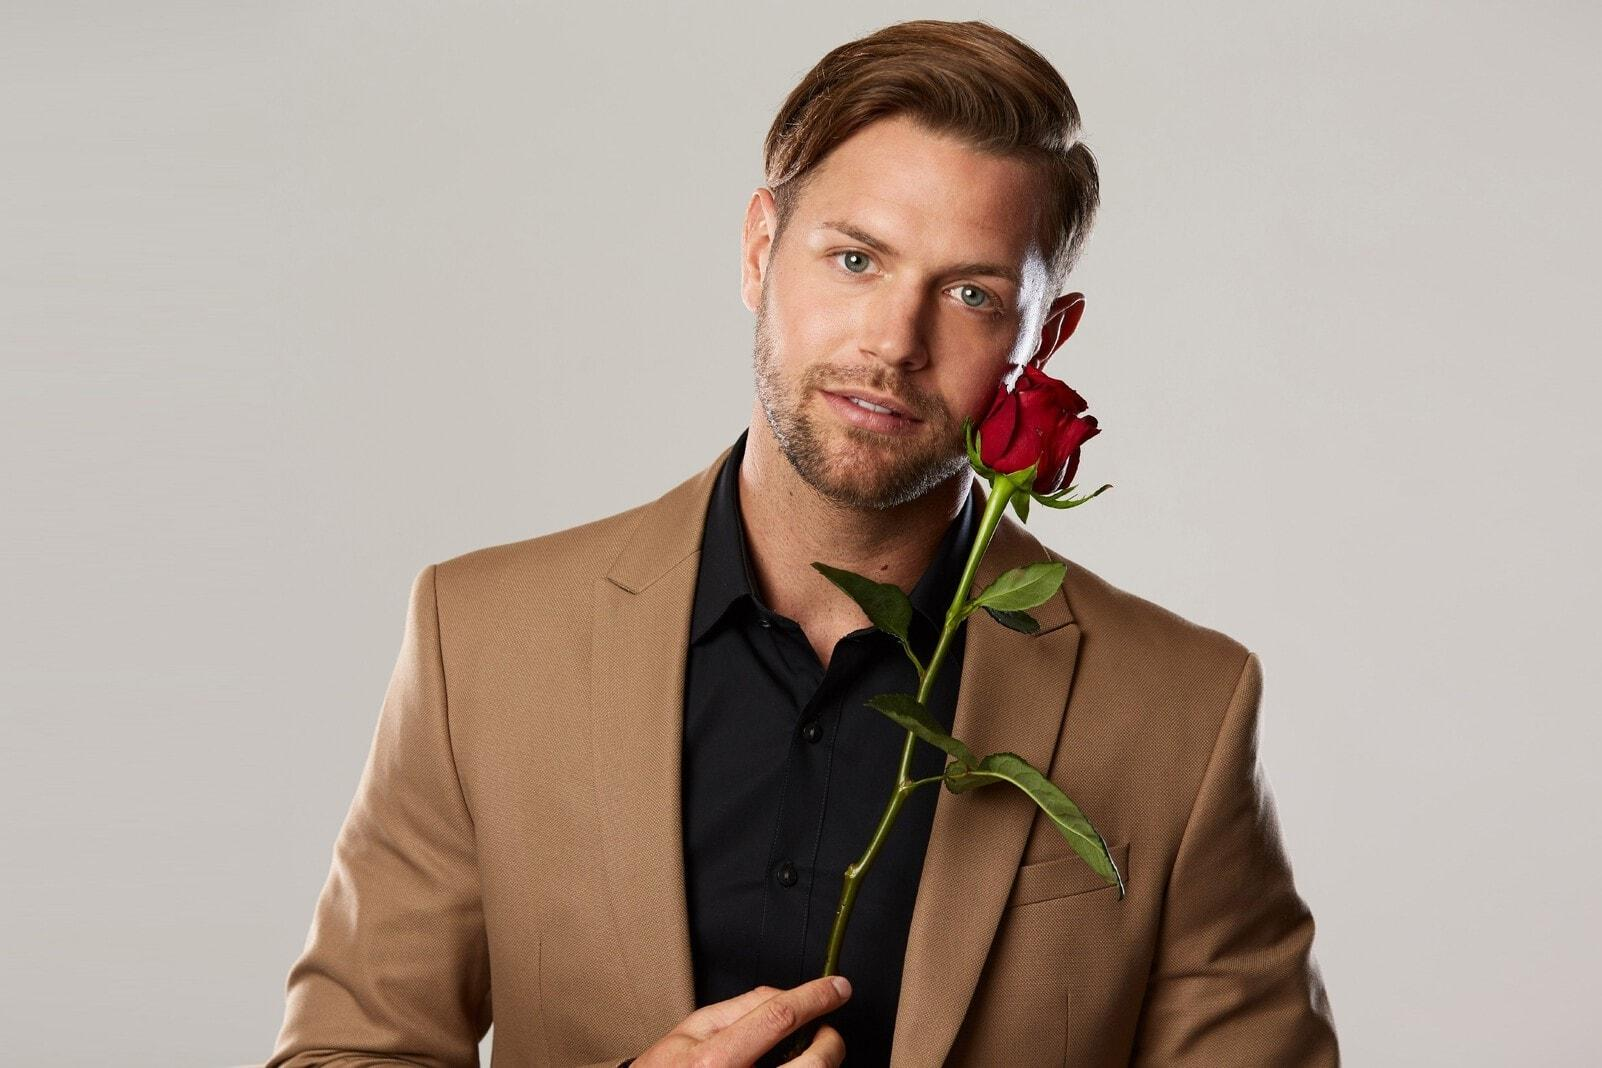 Bachelorette-Kandidat Florian